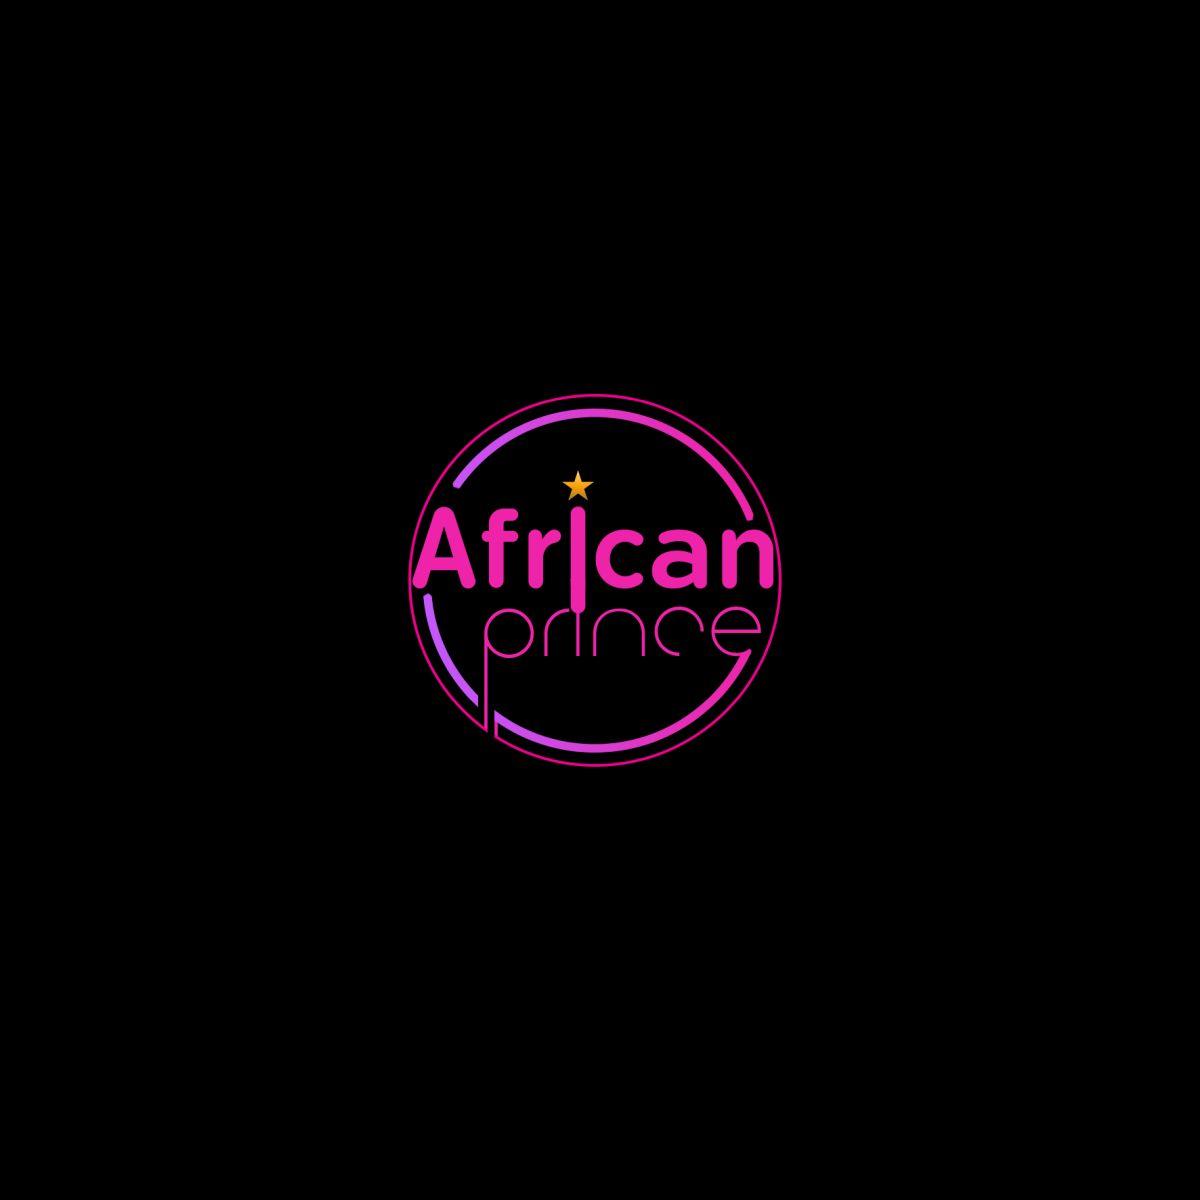 @africanprince